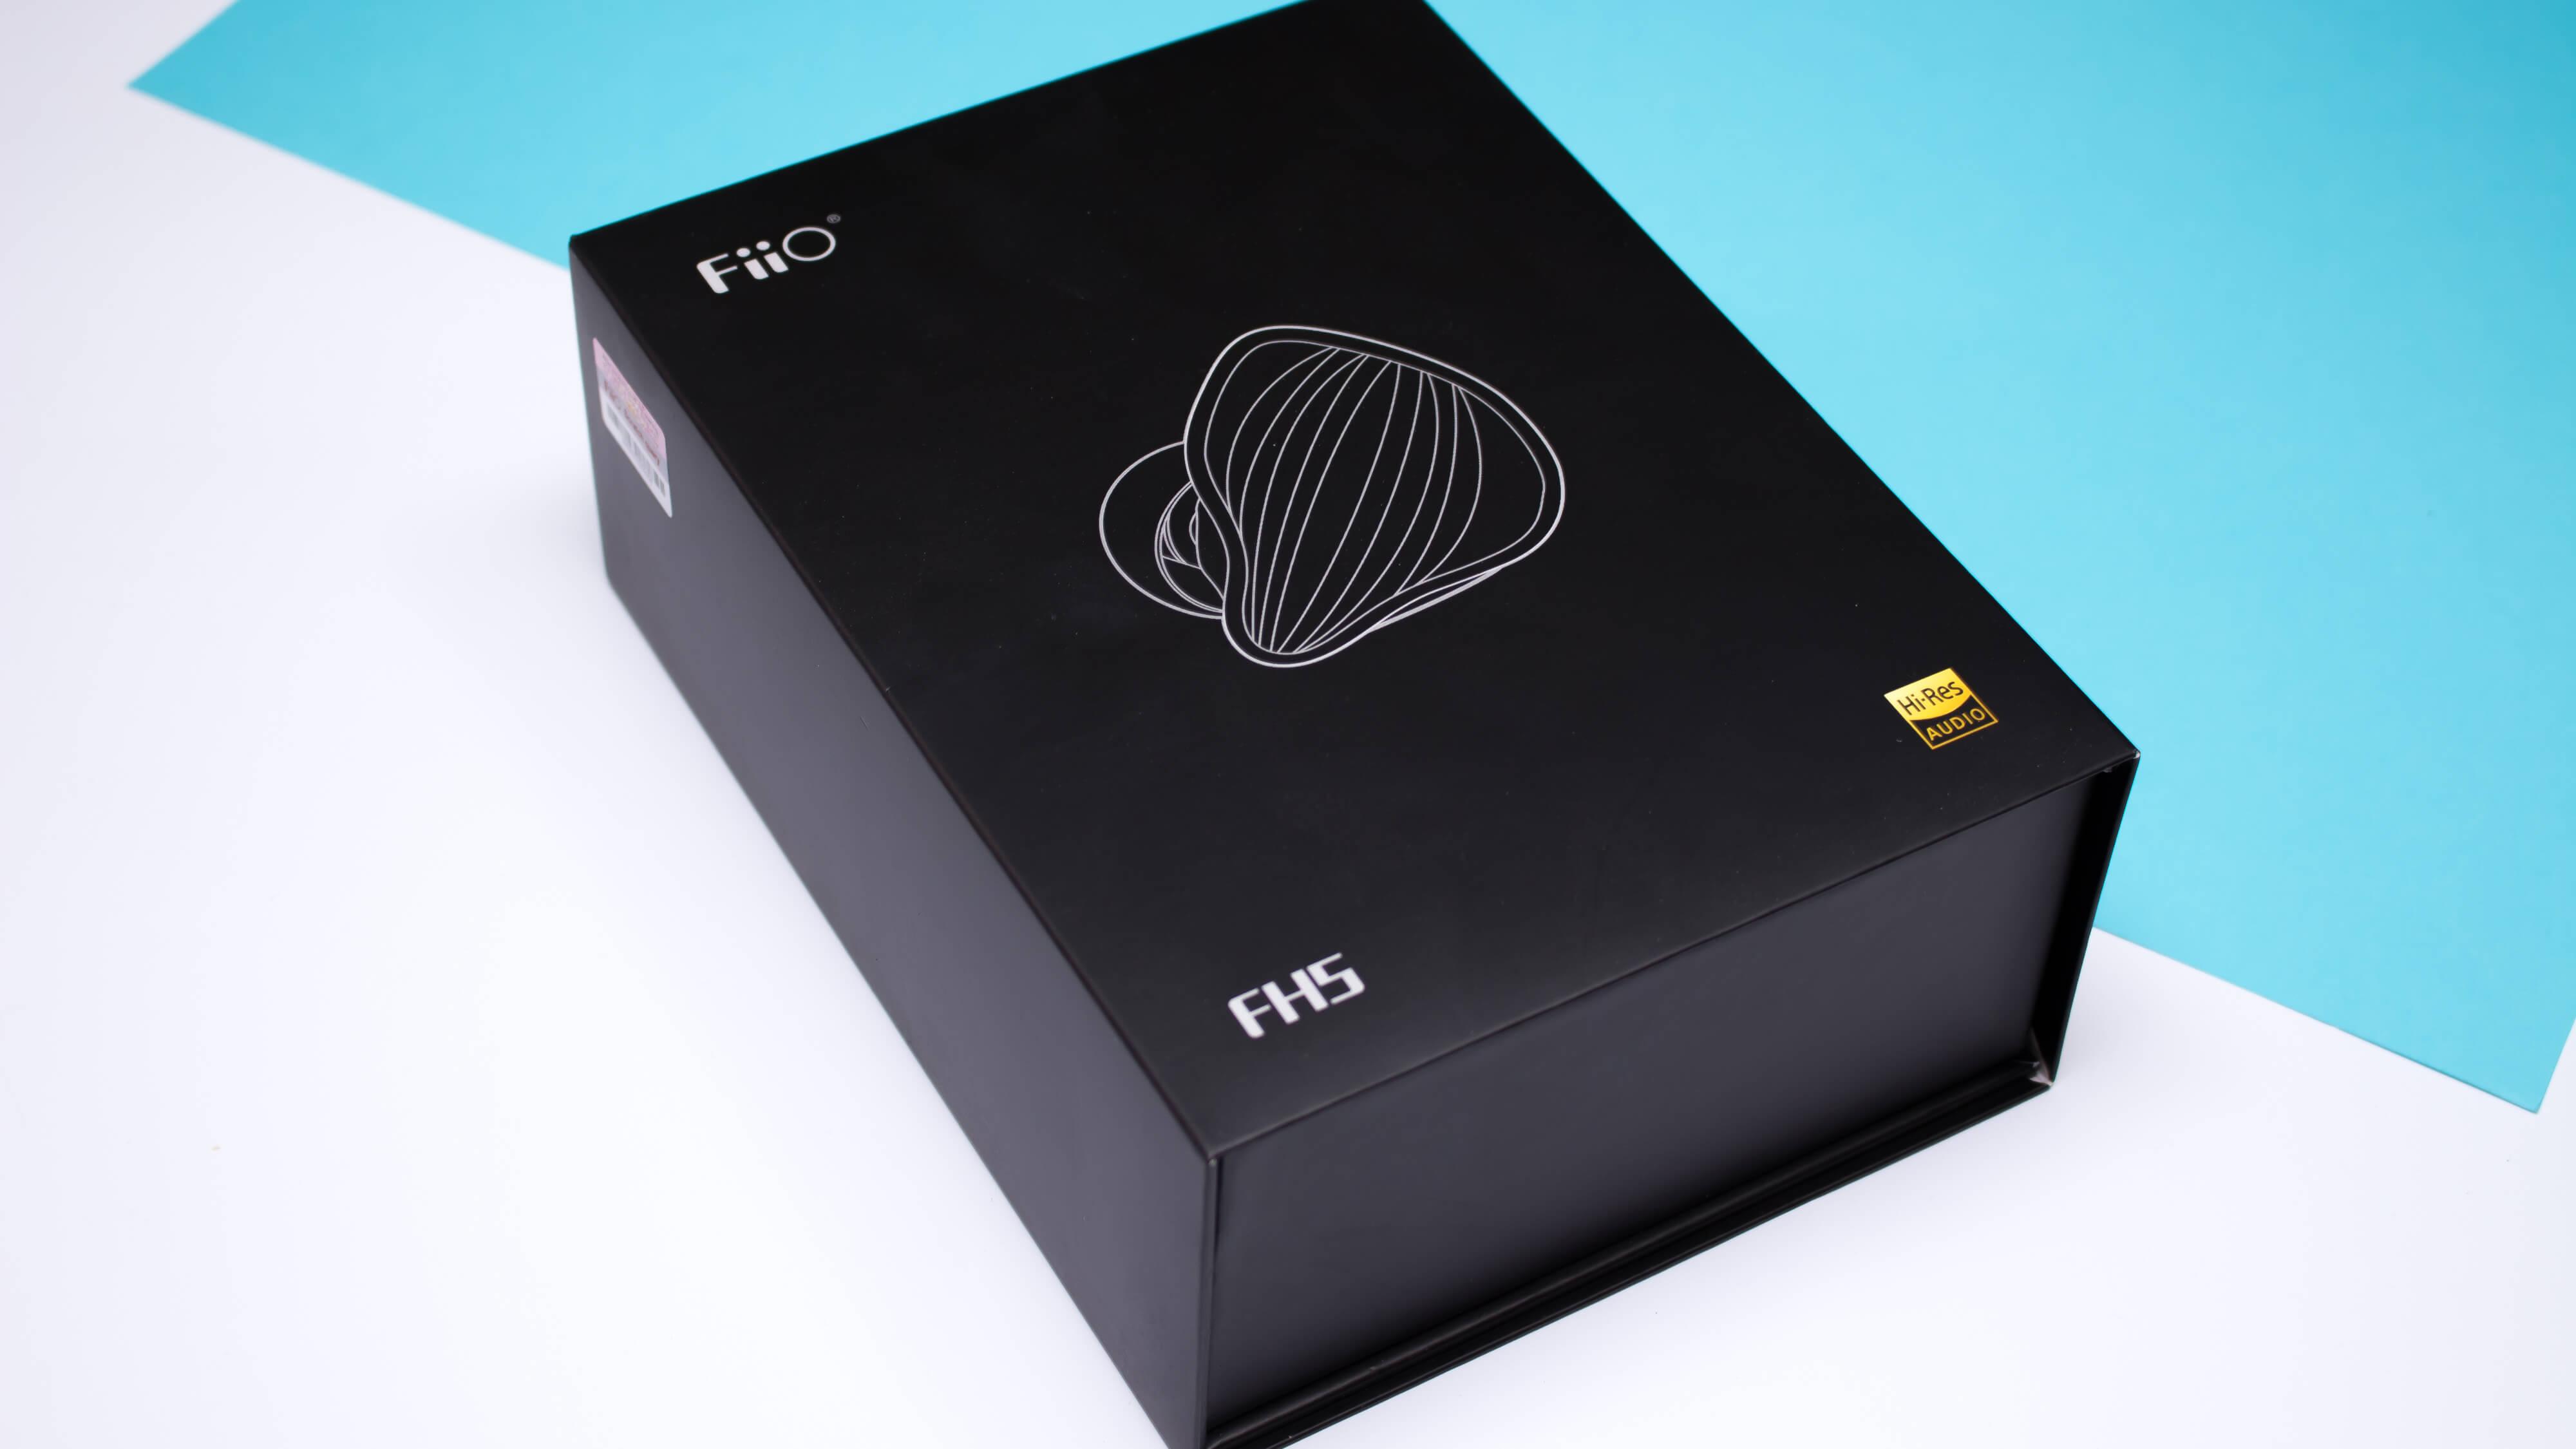 fiio-fh5-box